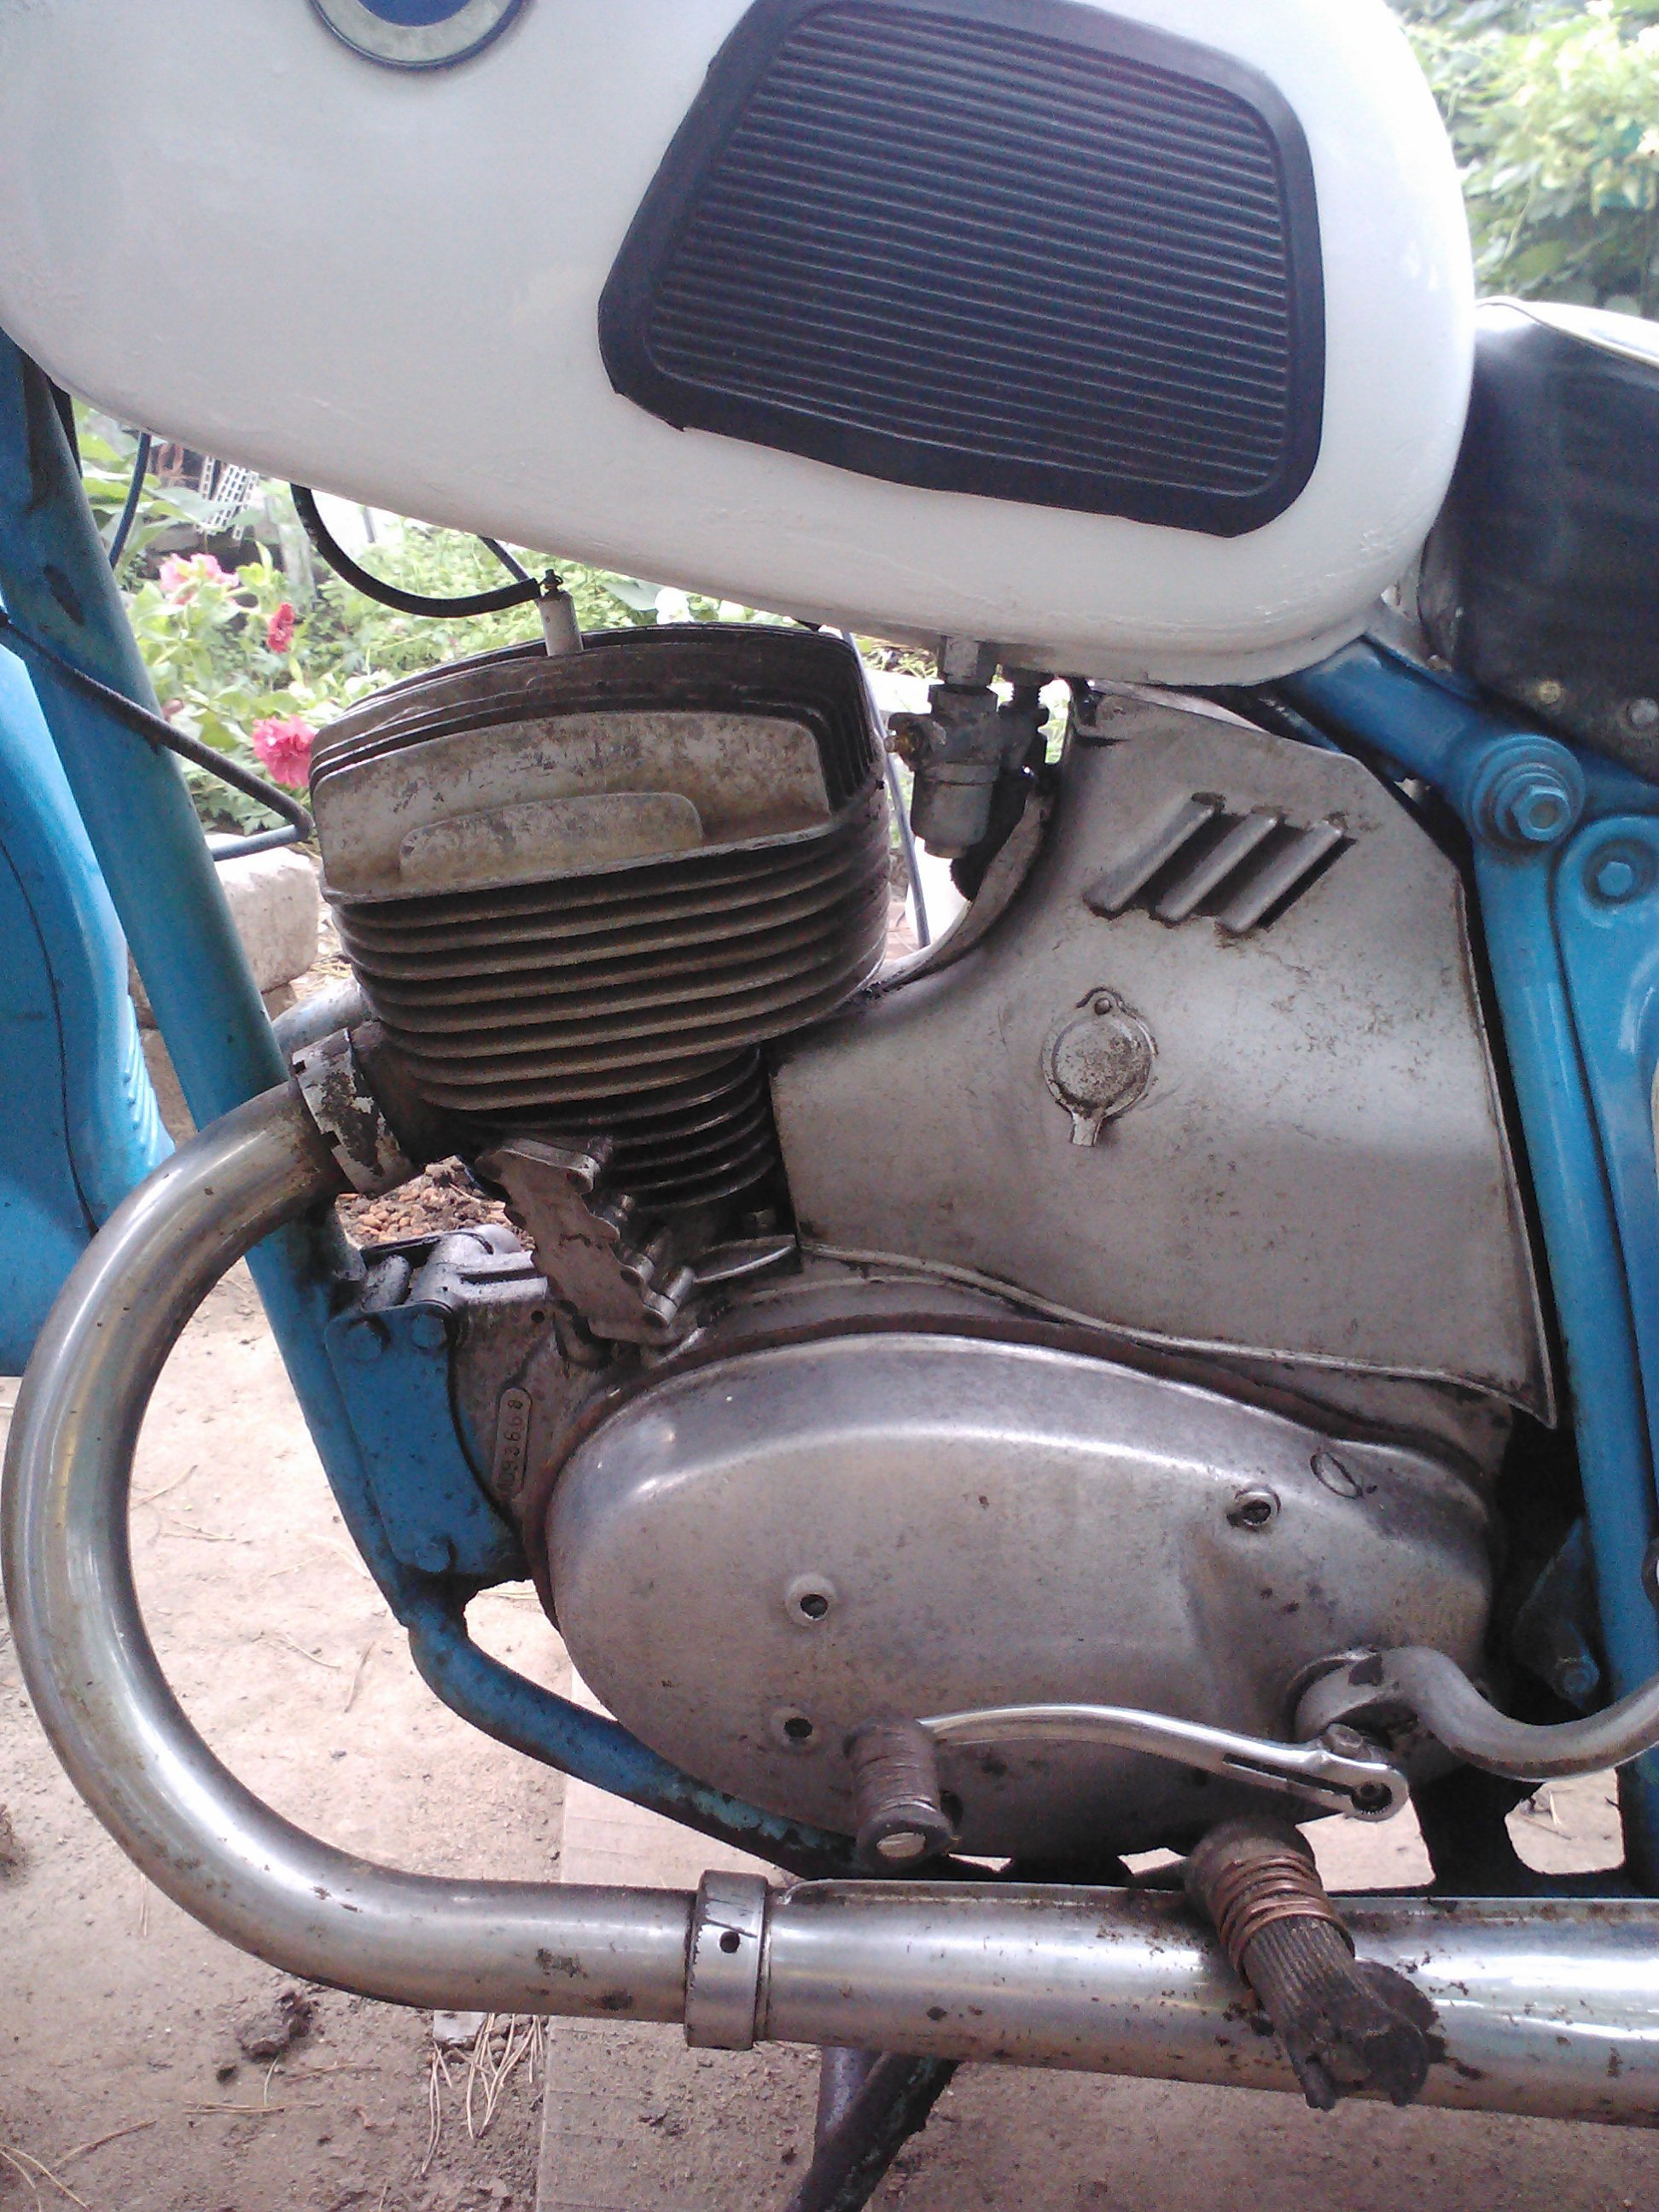 мотоцикл не заводится